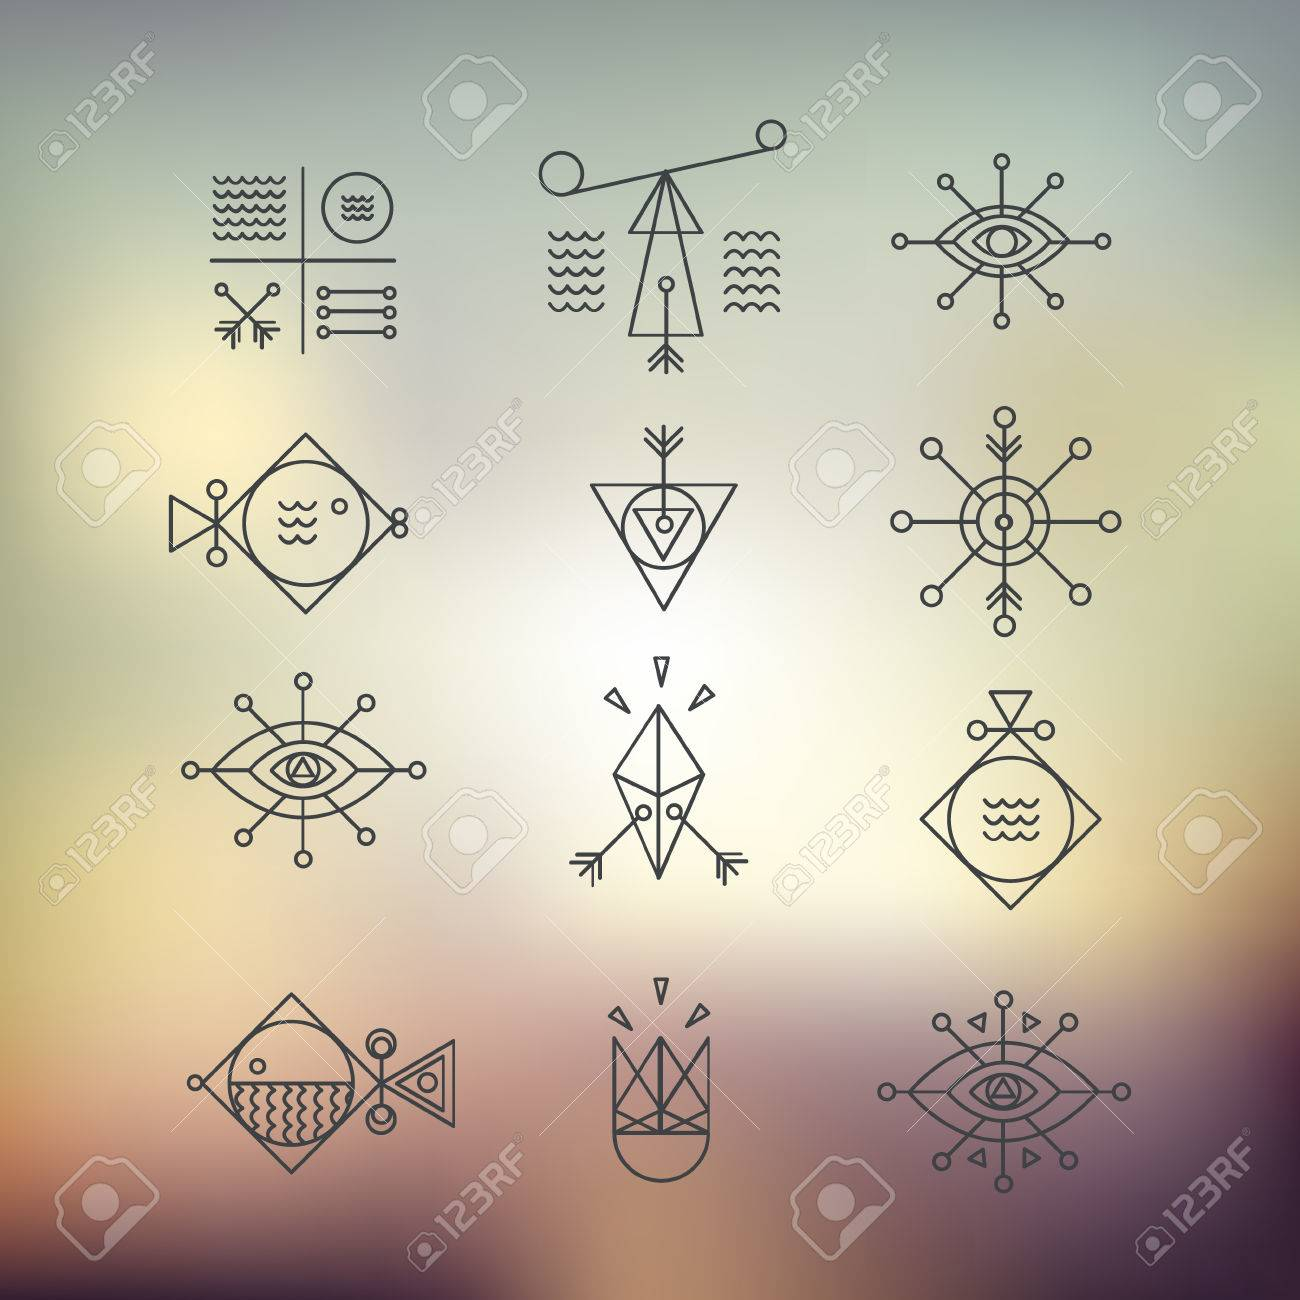 Line Shapes Geometry Alchemy Religion Philosophy Spirituality